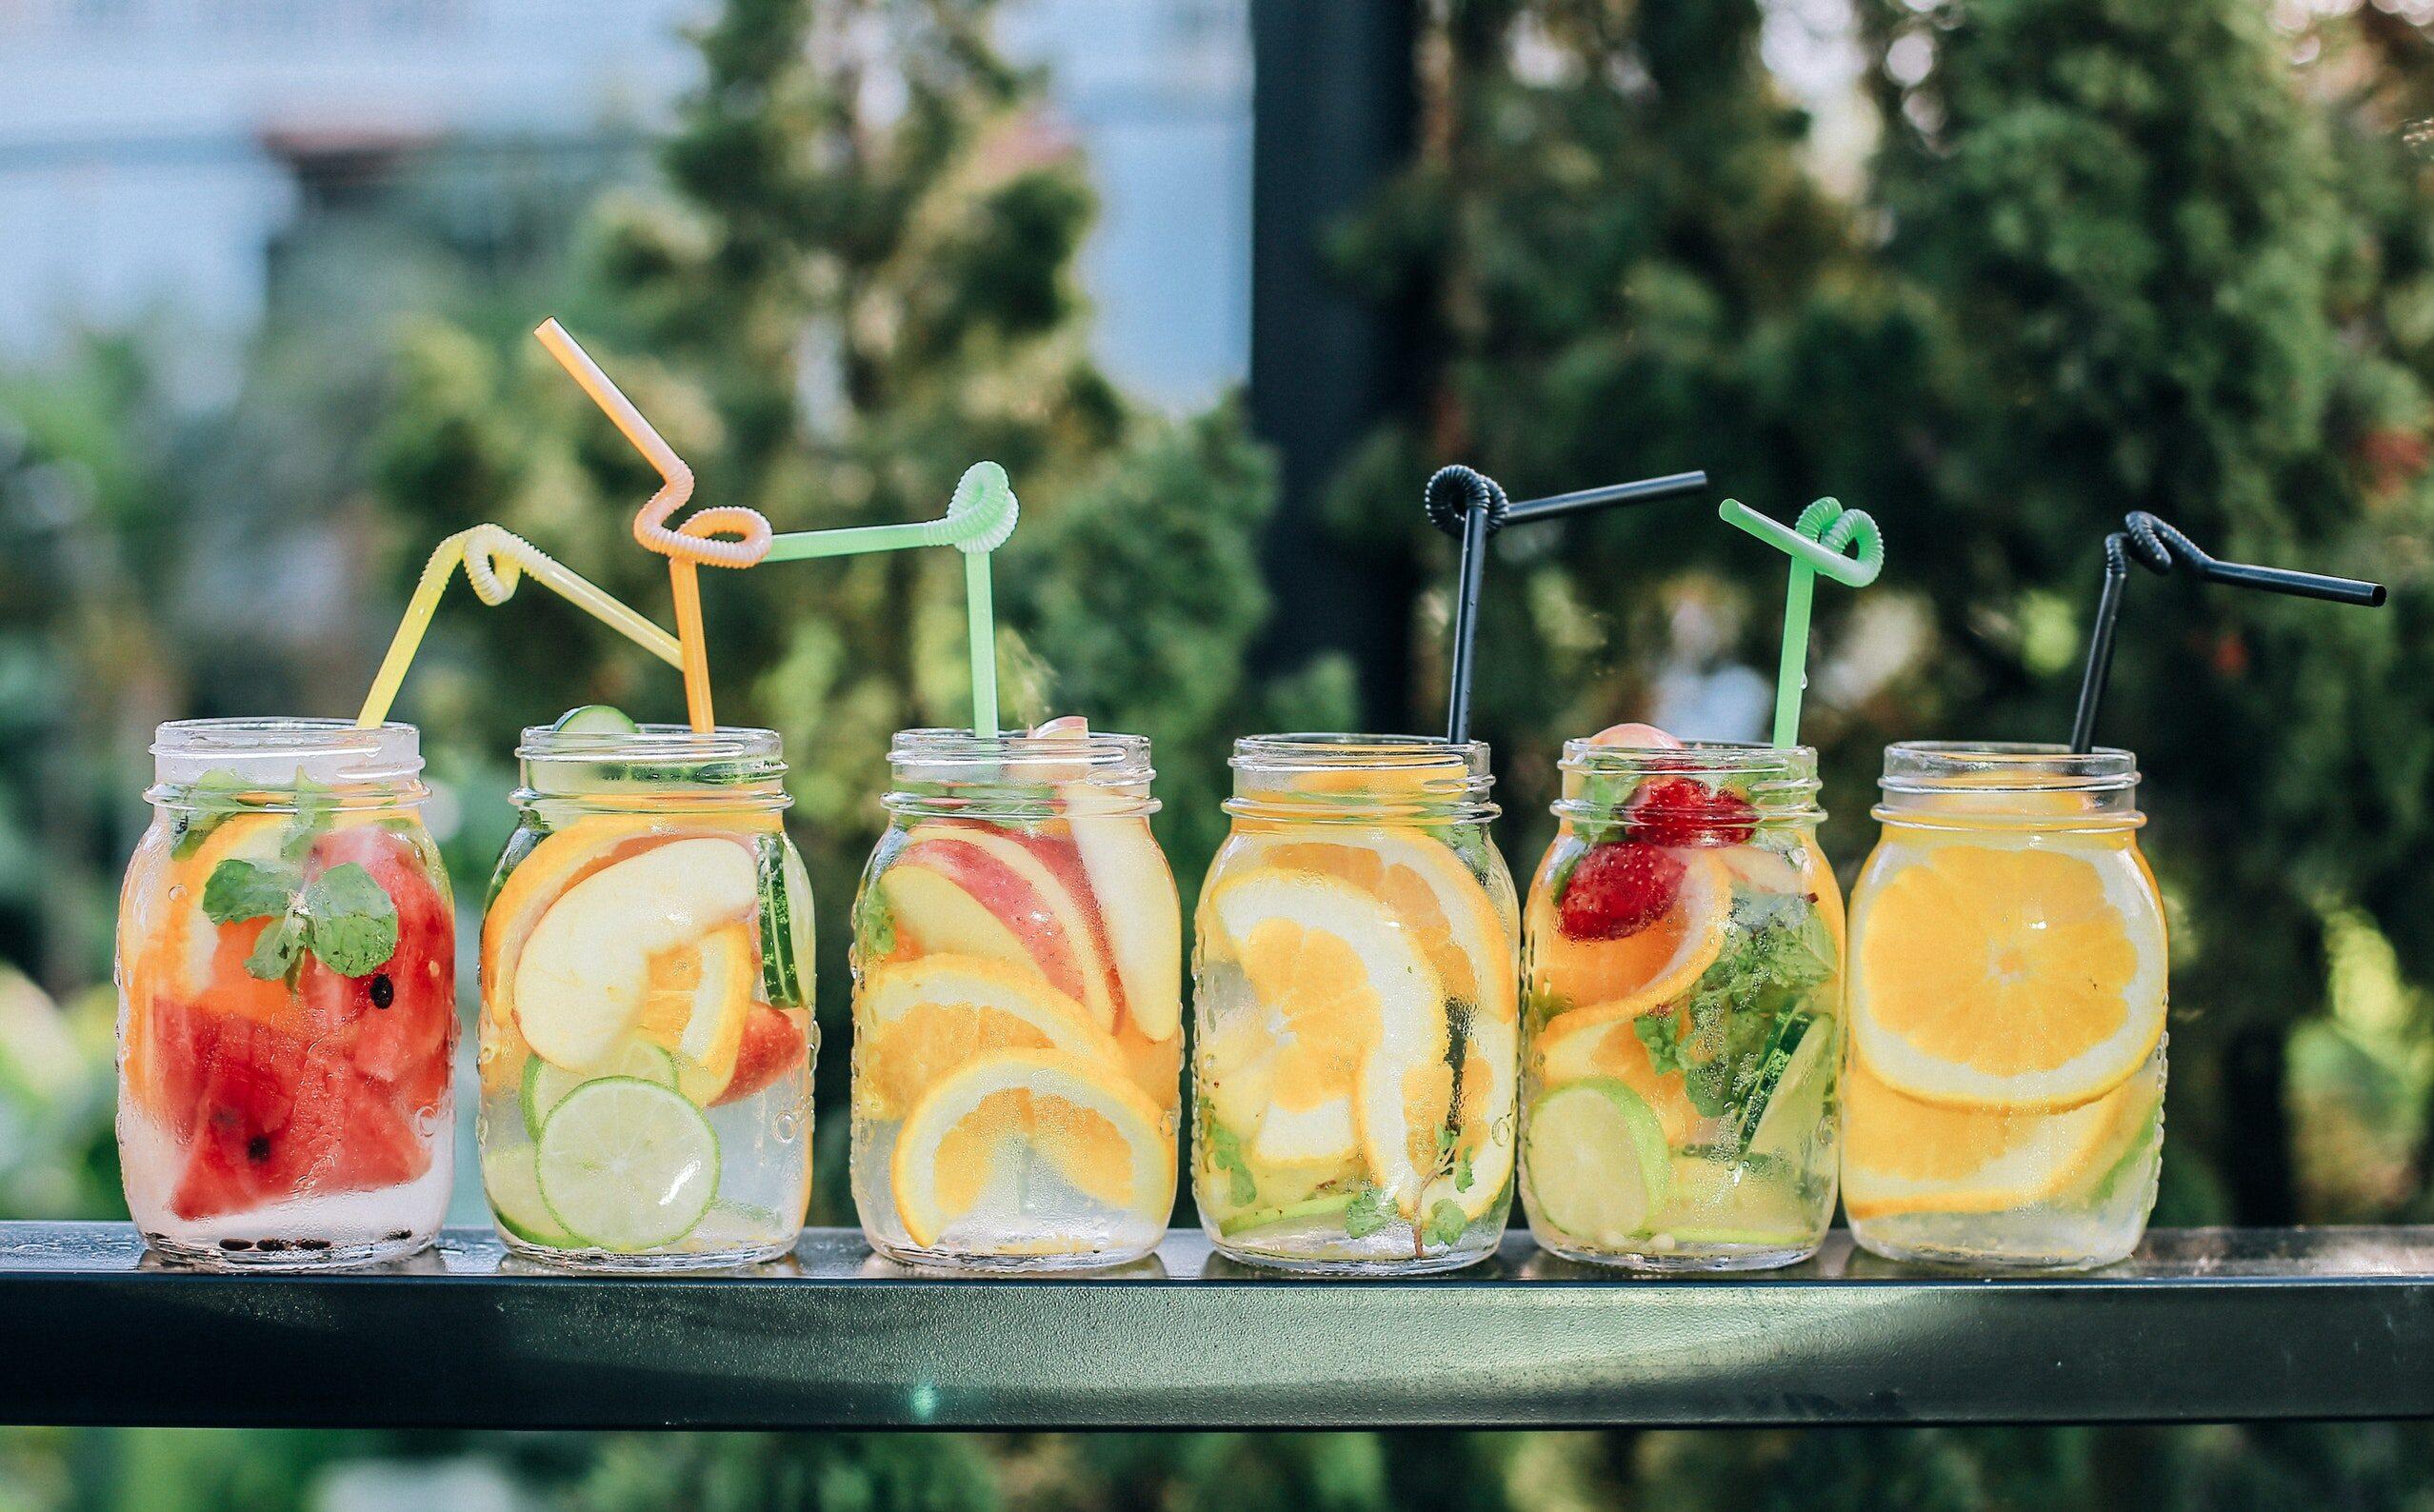 Soki i wody smakowe